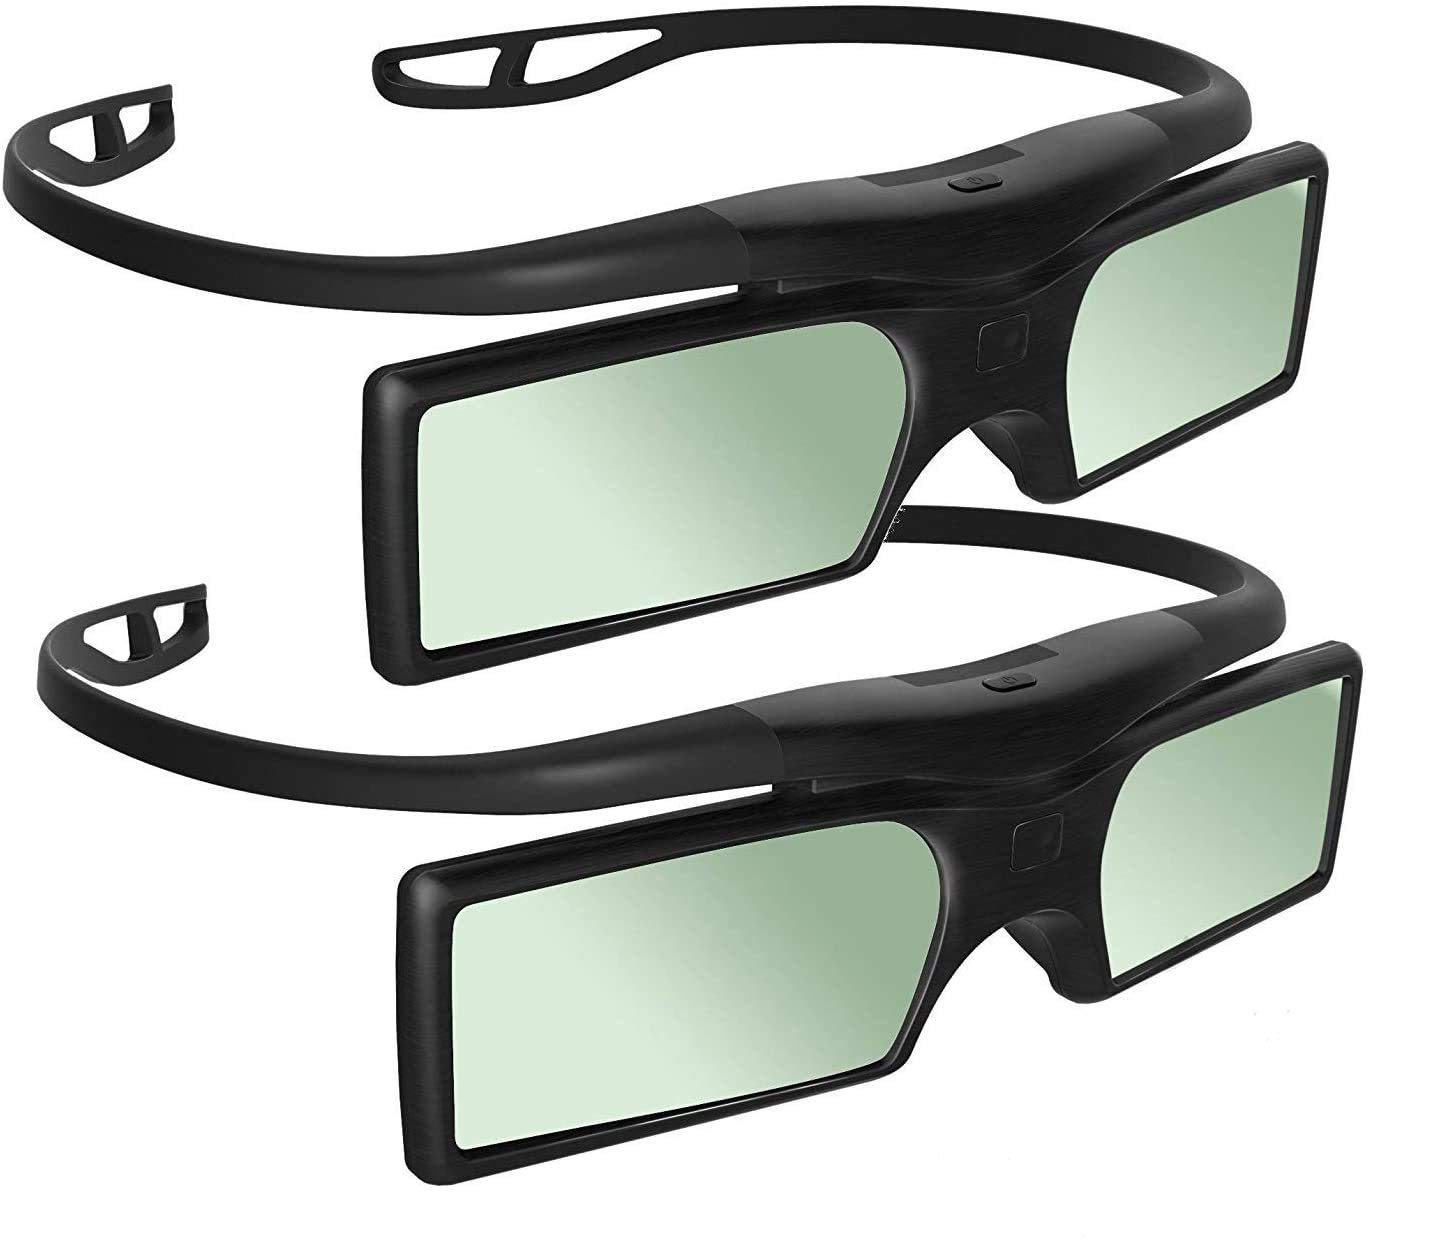 Sintron 2X 3D RF Glasses Eyewear for Sony Panasonic Samsung 3D TV, Compatible with TDG-BT400A TDG-BT500A SSG-5100GB TY-ER3D4MU (2 Pairs)